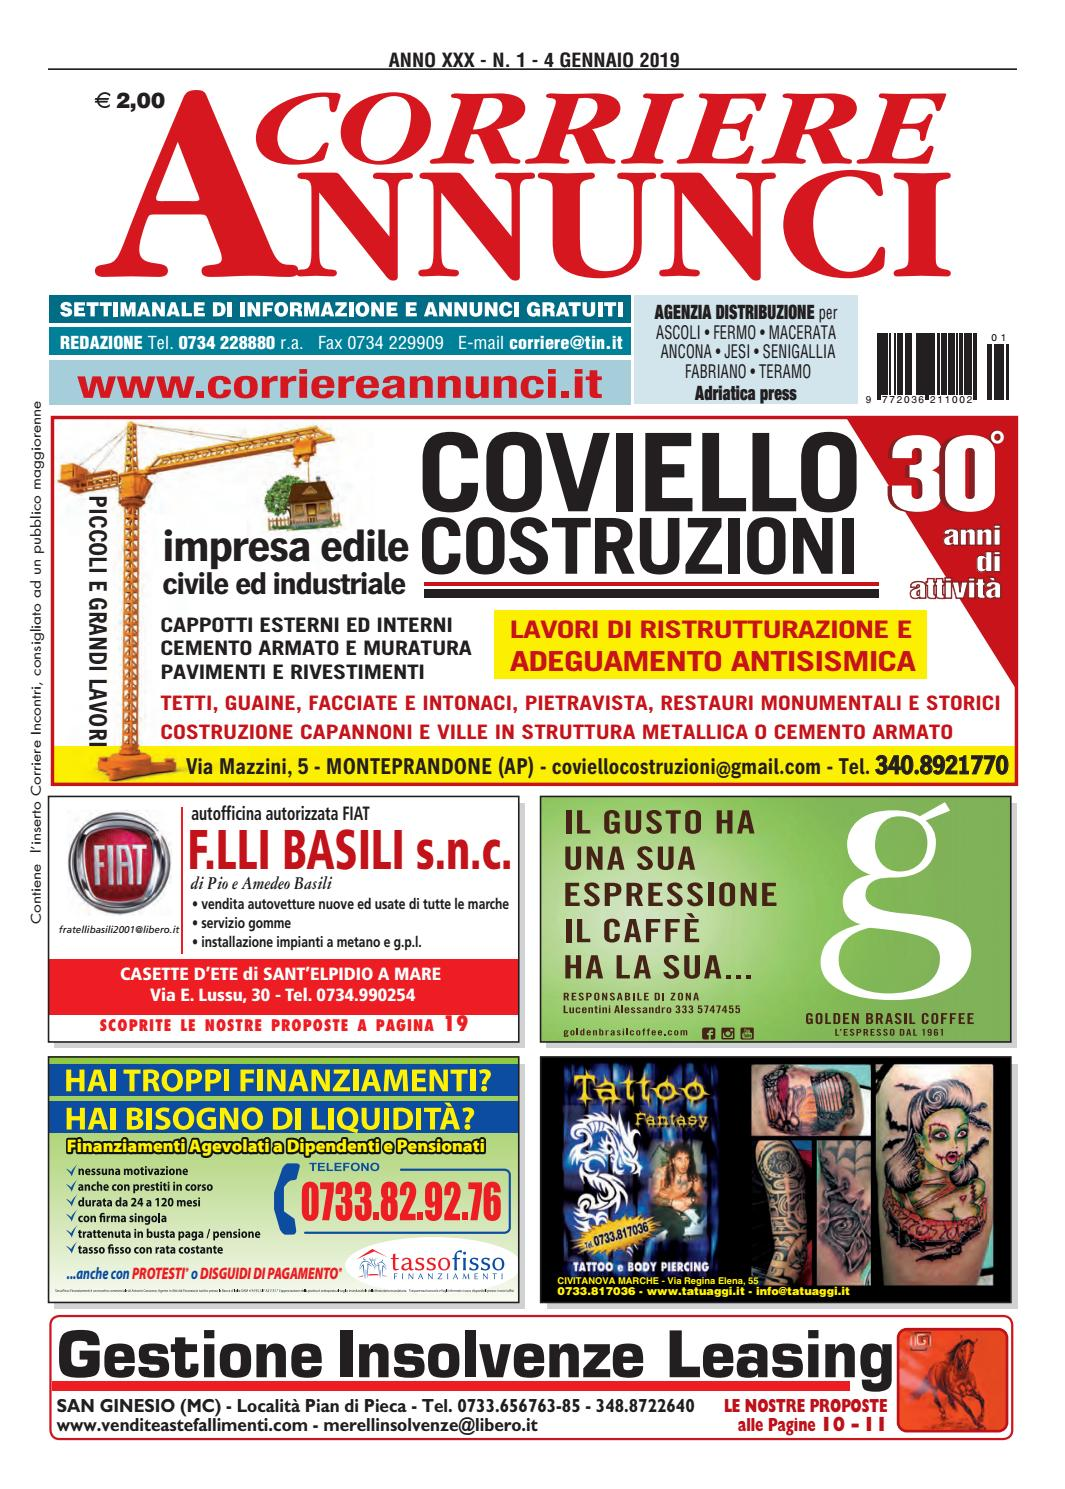 Corriere 1-2019 by Corriere Annunci - issuu b73fc31c3fe